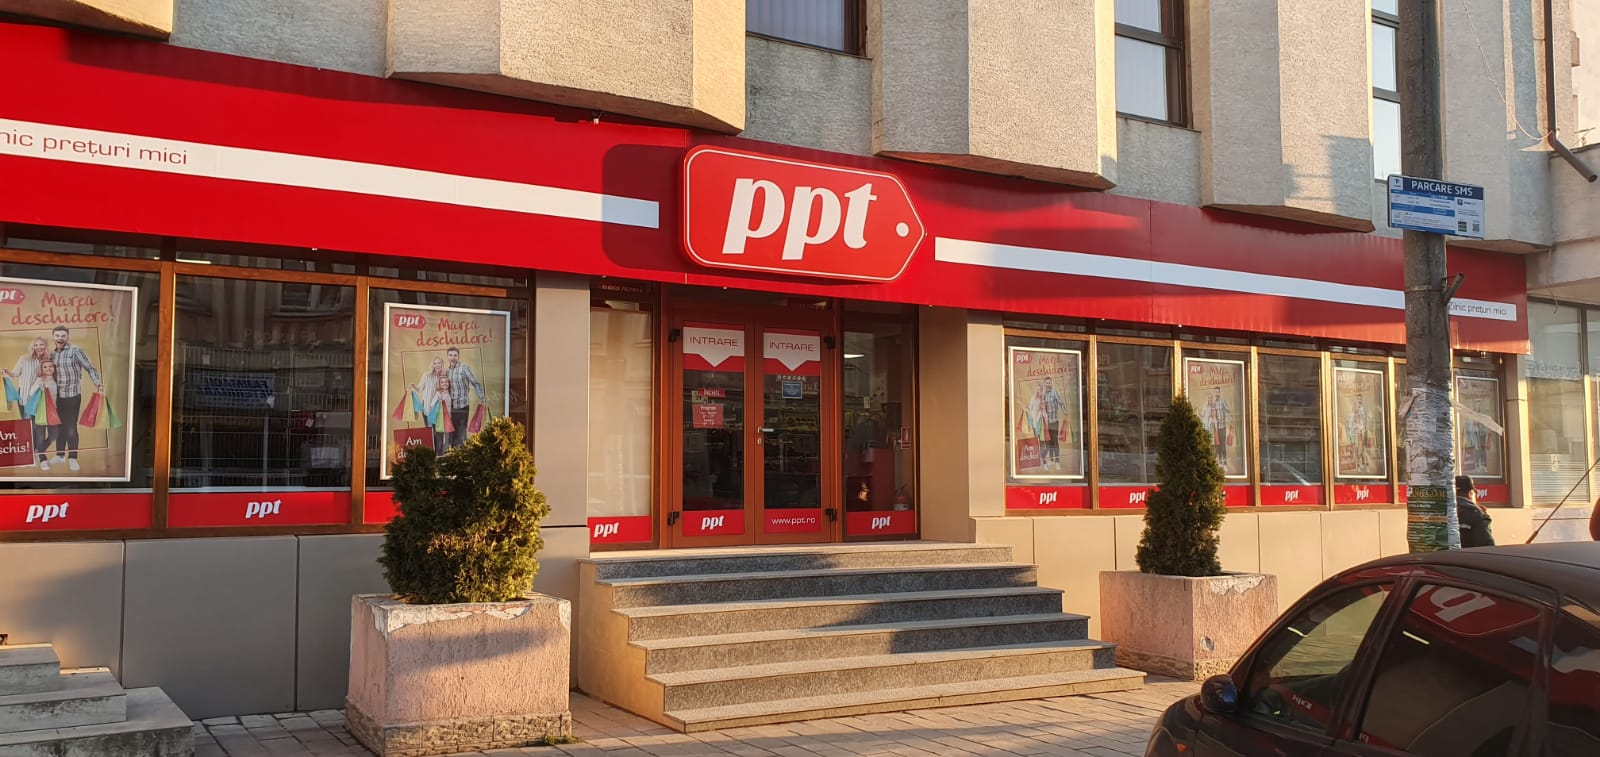 PPT Dorohoi